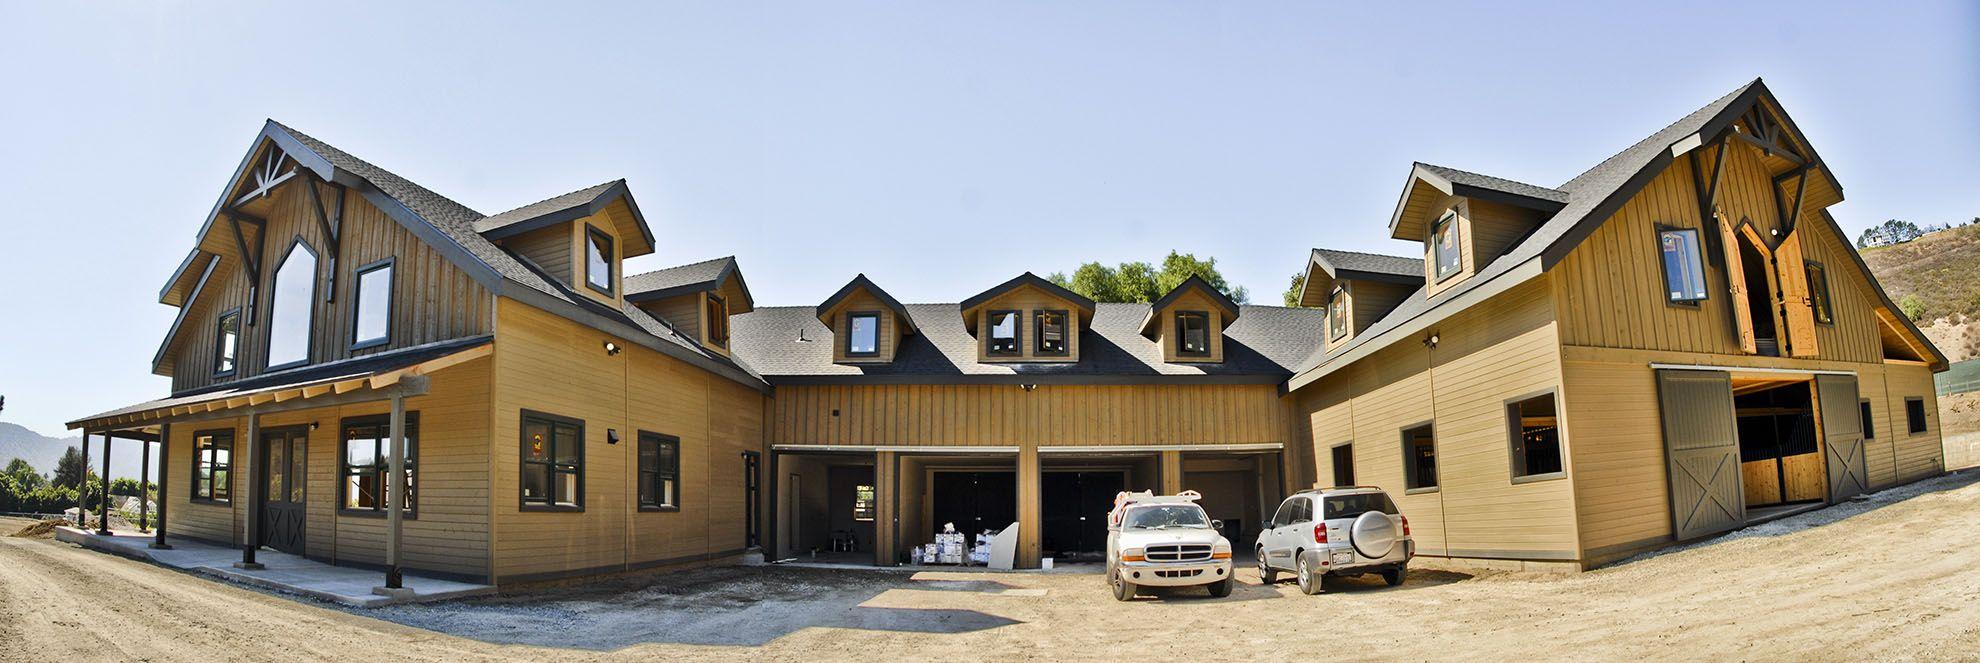 barn house attached | Barndo | Pinterest | Barn, House and Barndominium